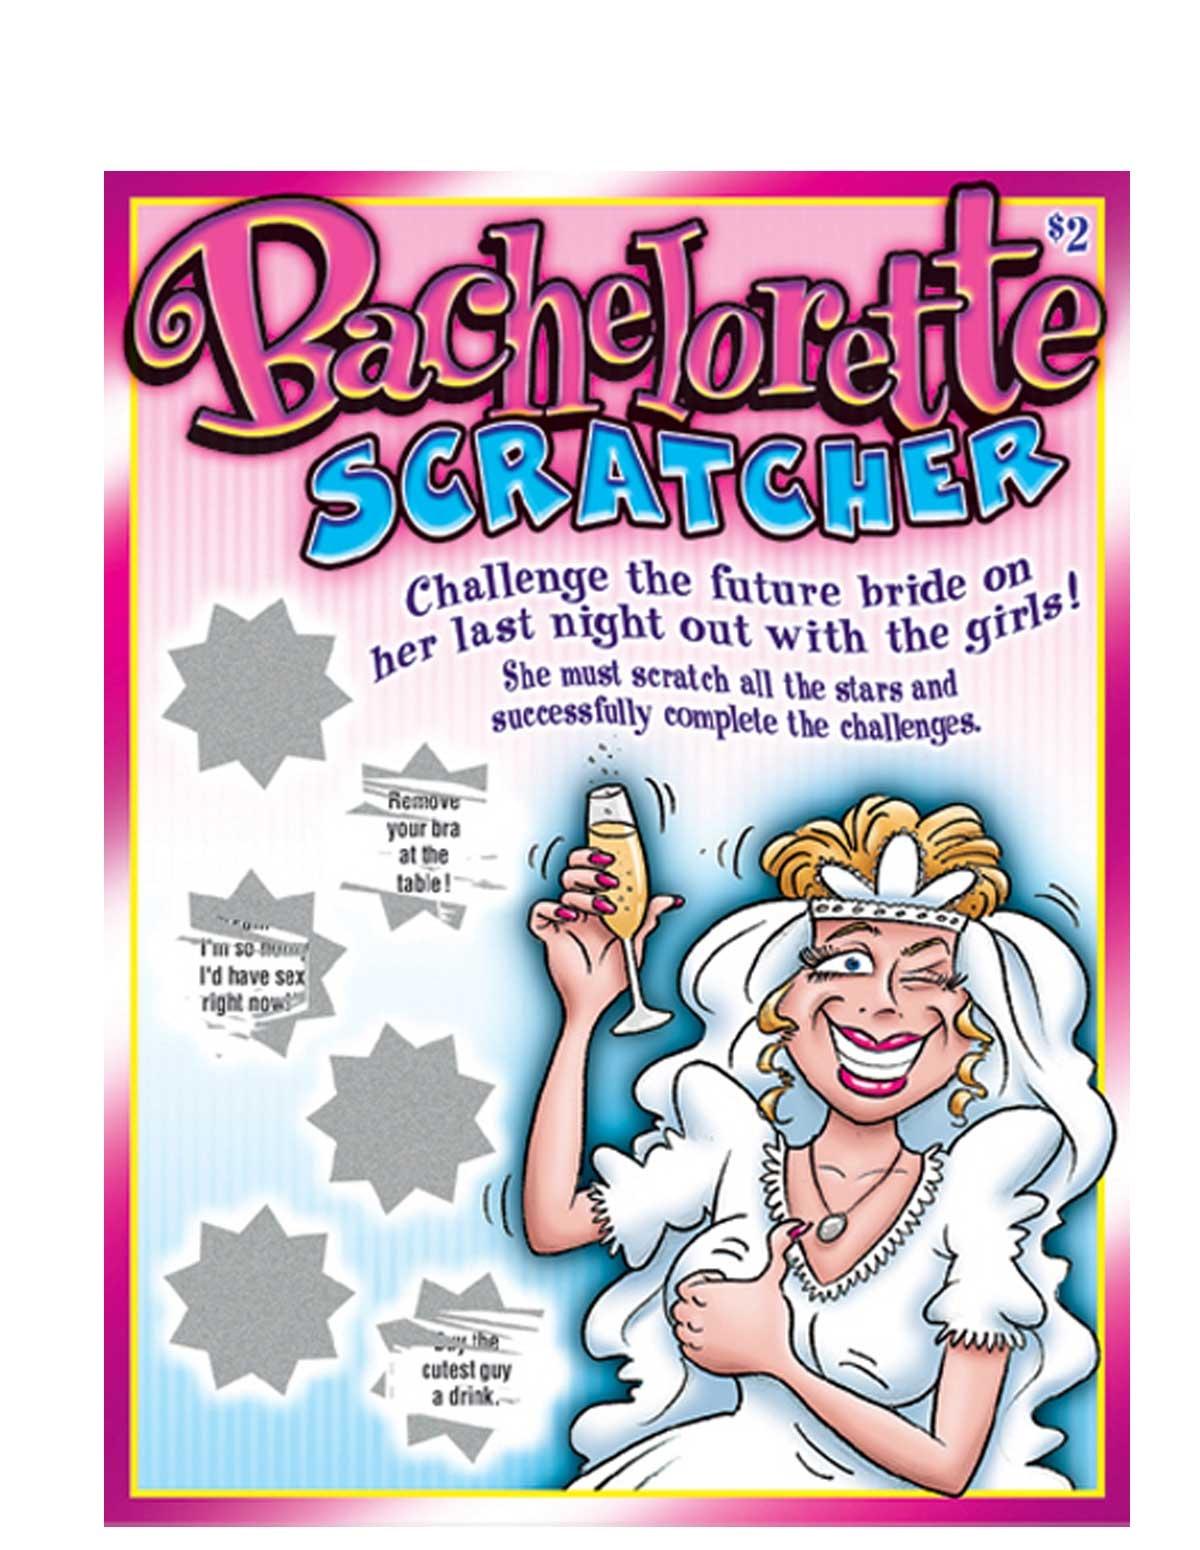 Bachelorette Scratchers